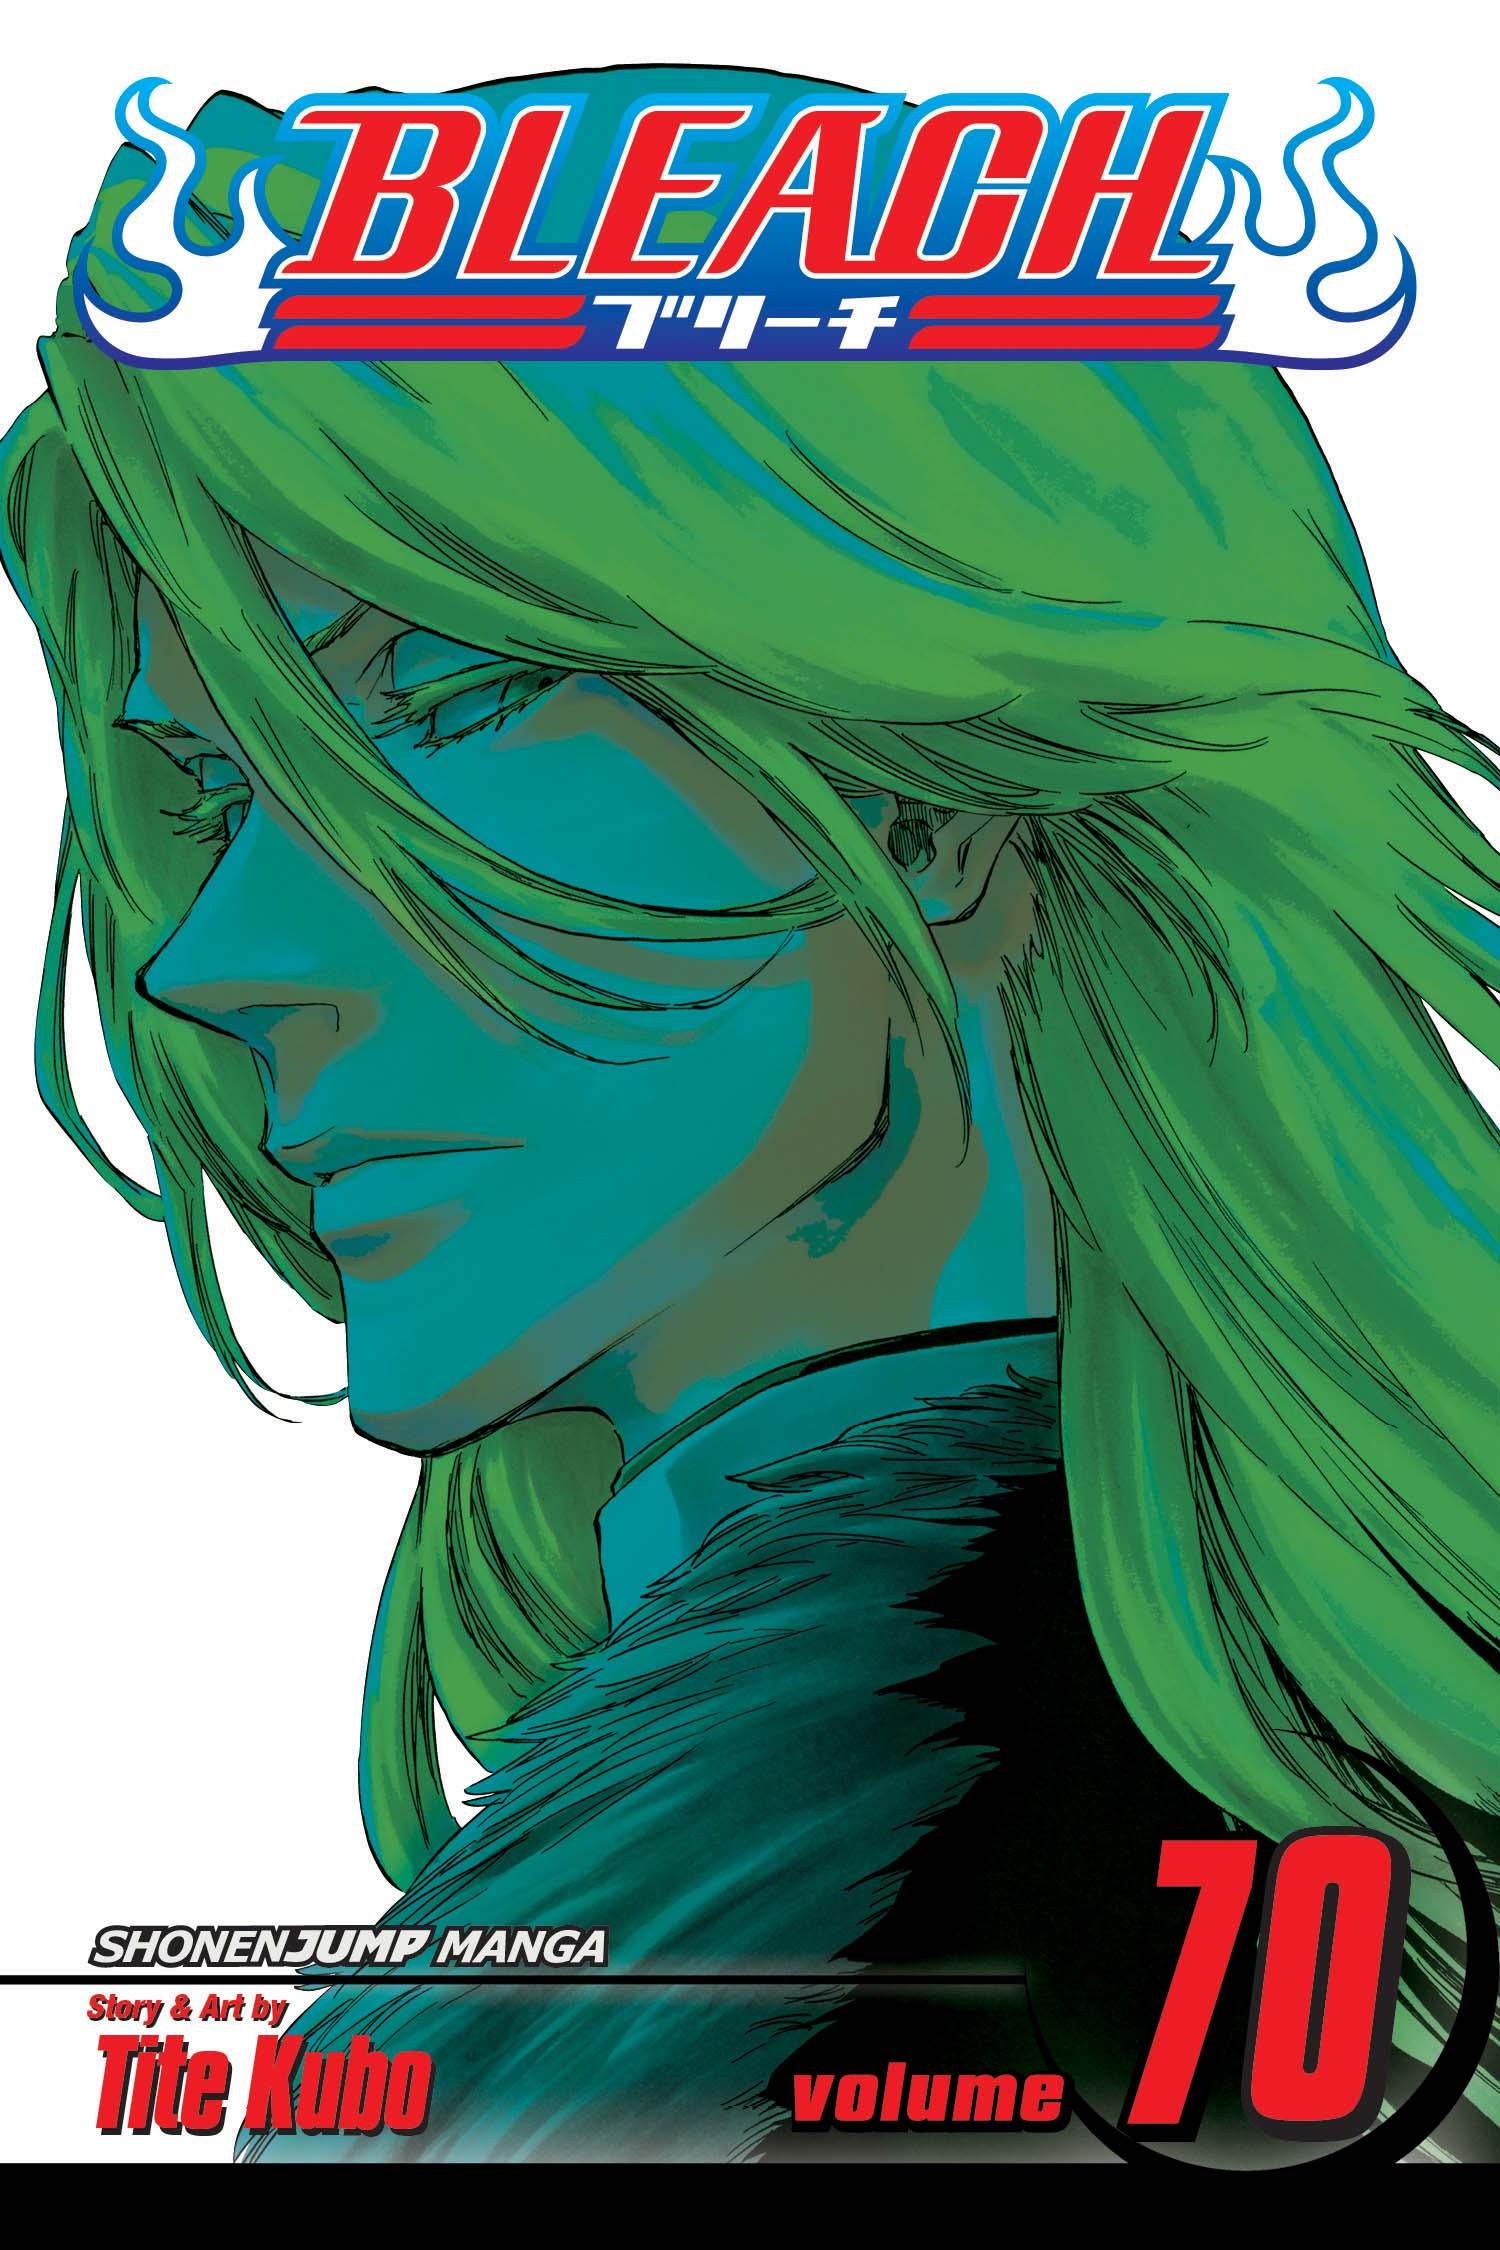 Bleach Manga Volume 70